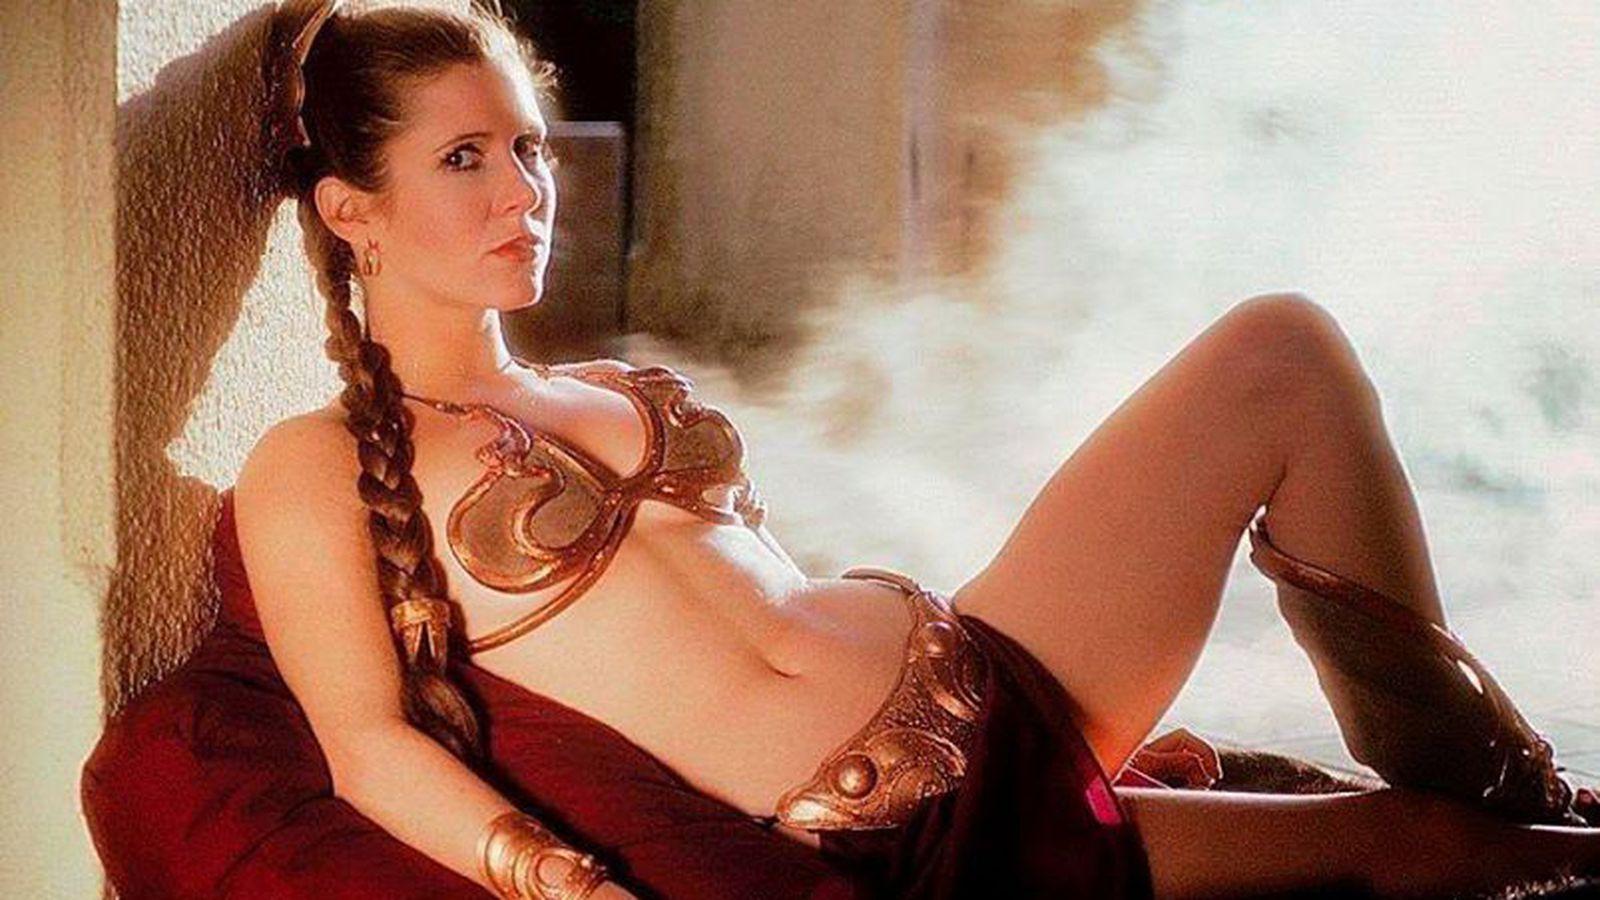 Princess leia sexy animation sluts